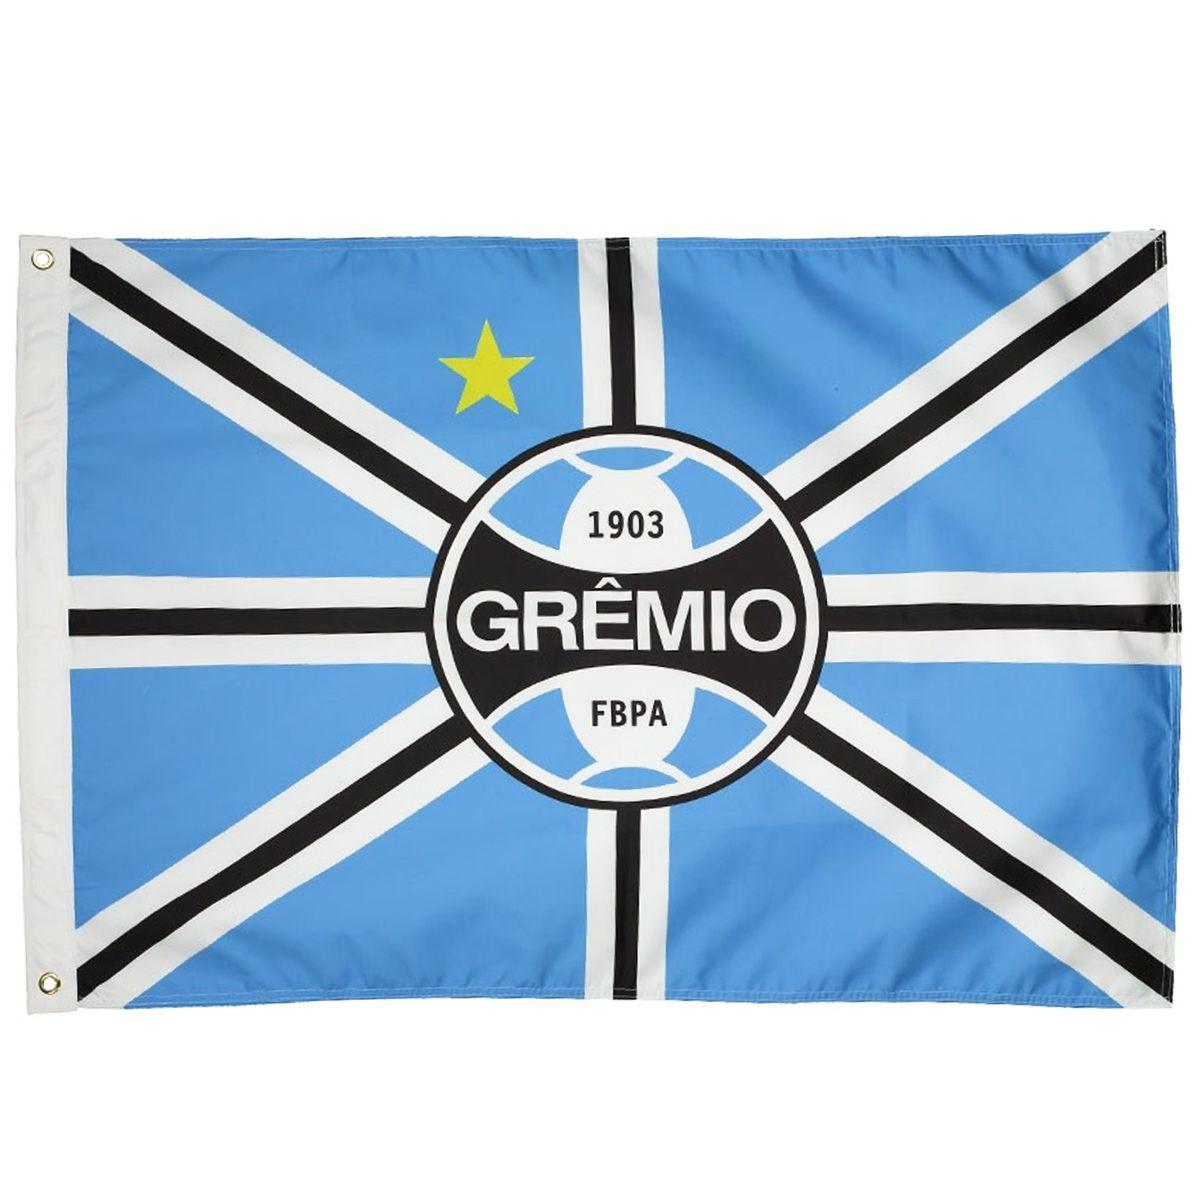 Bandeira Oficial do Grêmio